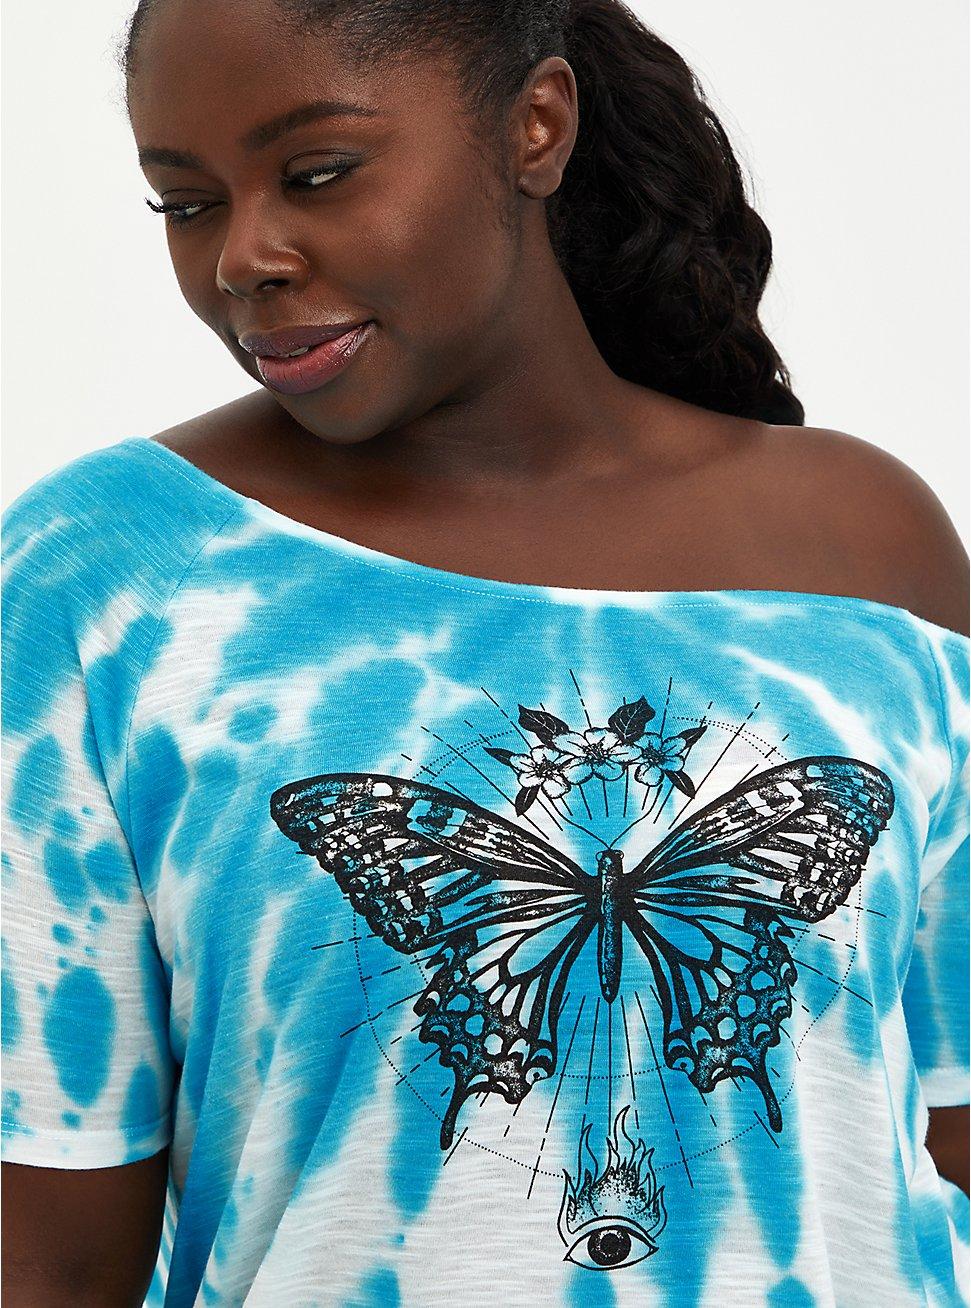 Off Shoulder Tee - Heritage Slub Blue Tie-Dye Butterfly, LIGHT BLUE, hi-res